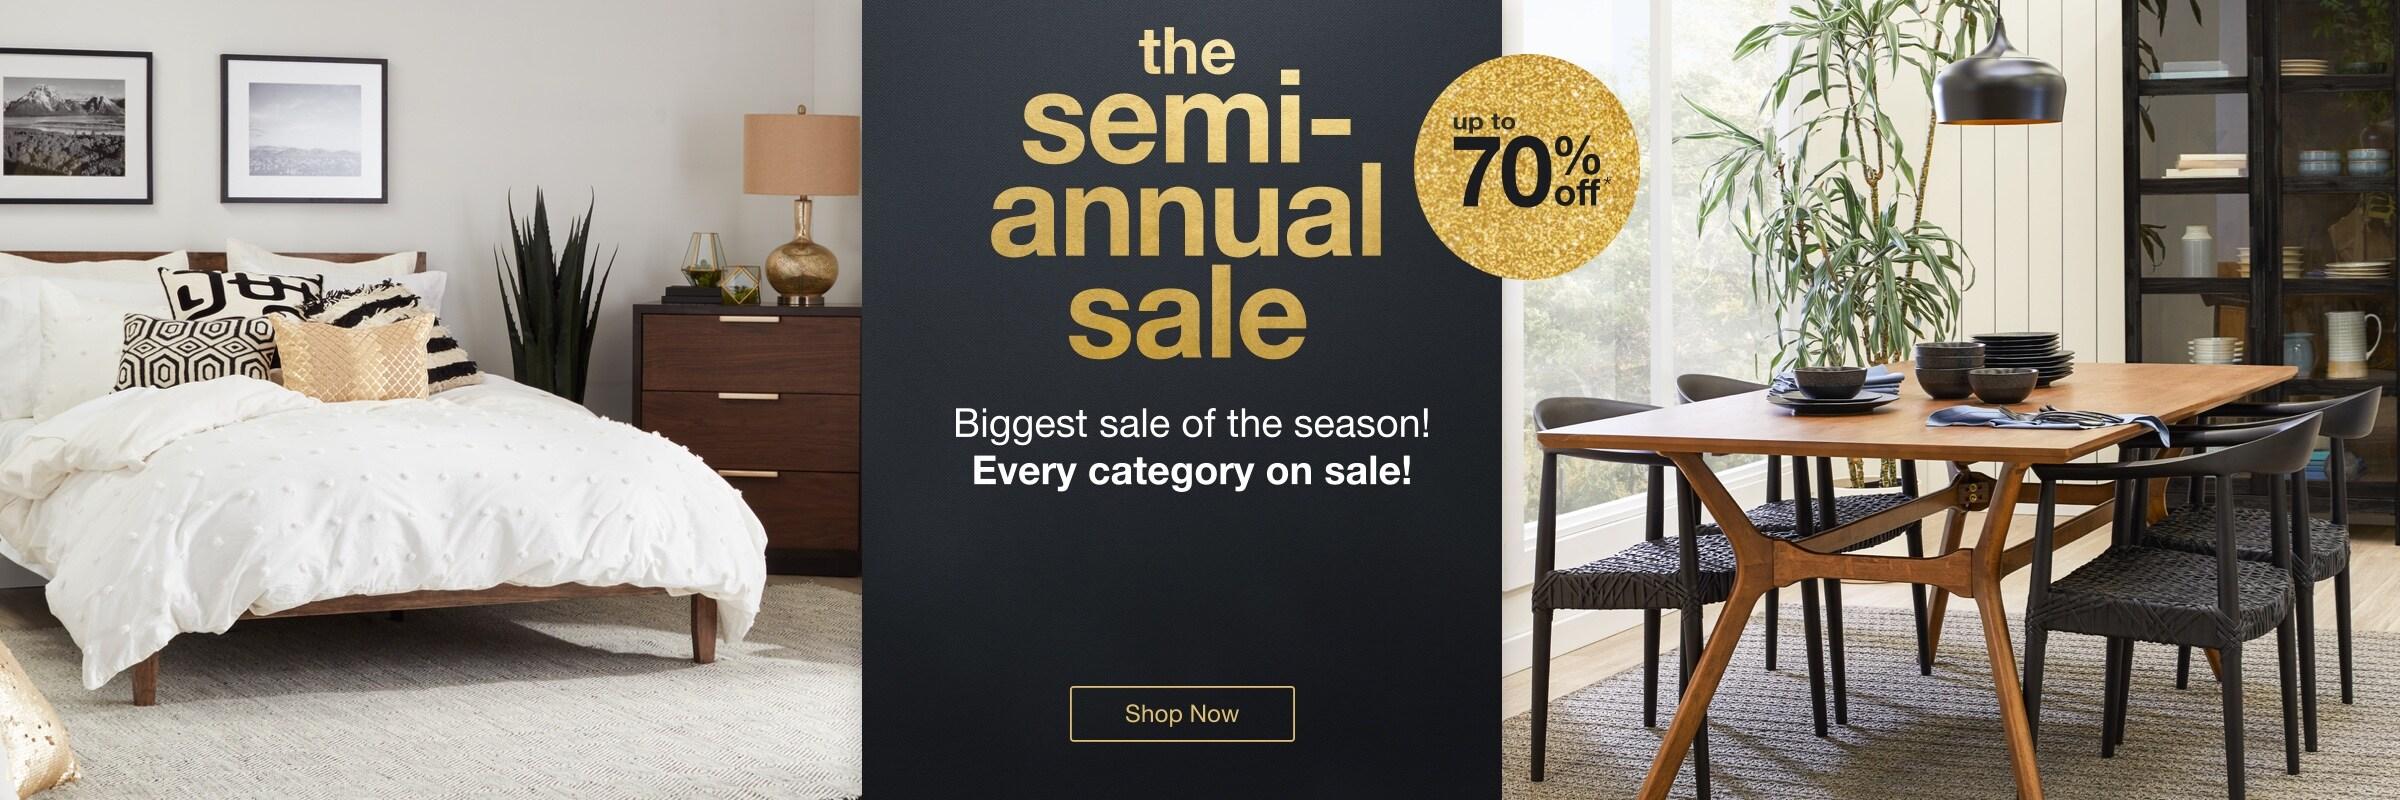 The Semi-Annual Sale desktop